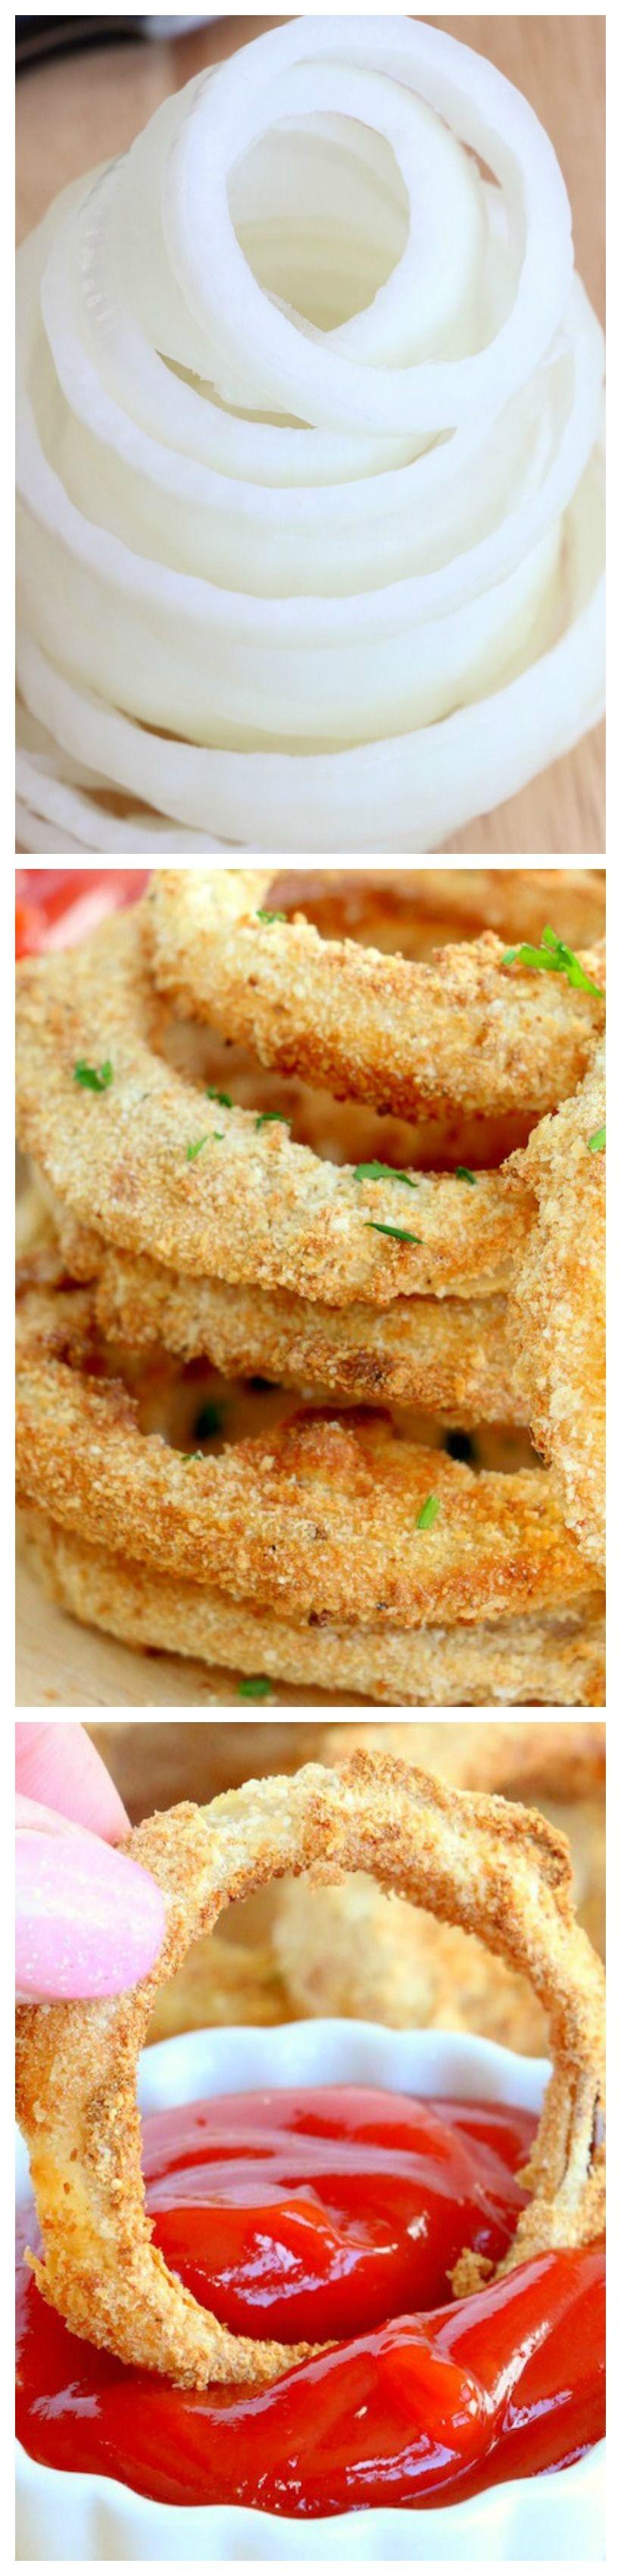 Air Fryer Onion Rings Recipe Yummy food, Onion rings